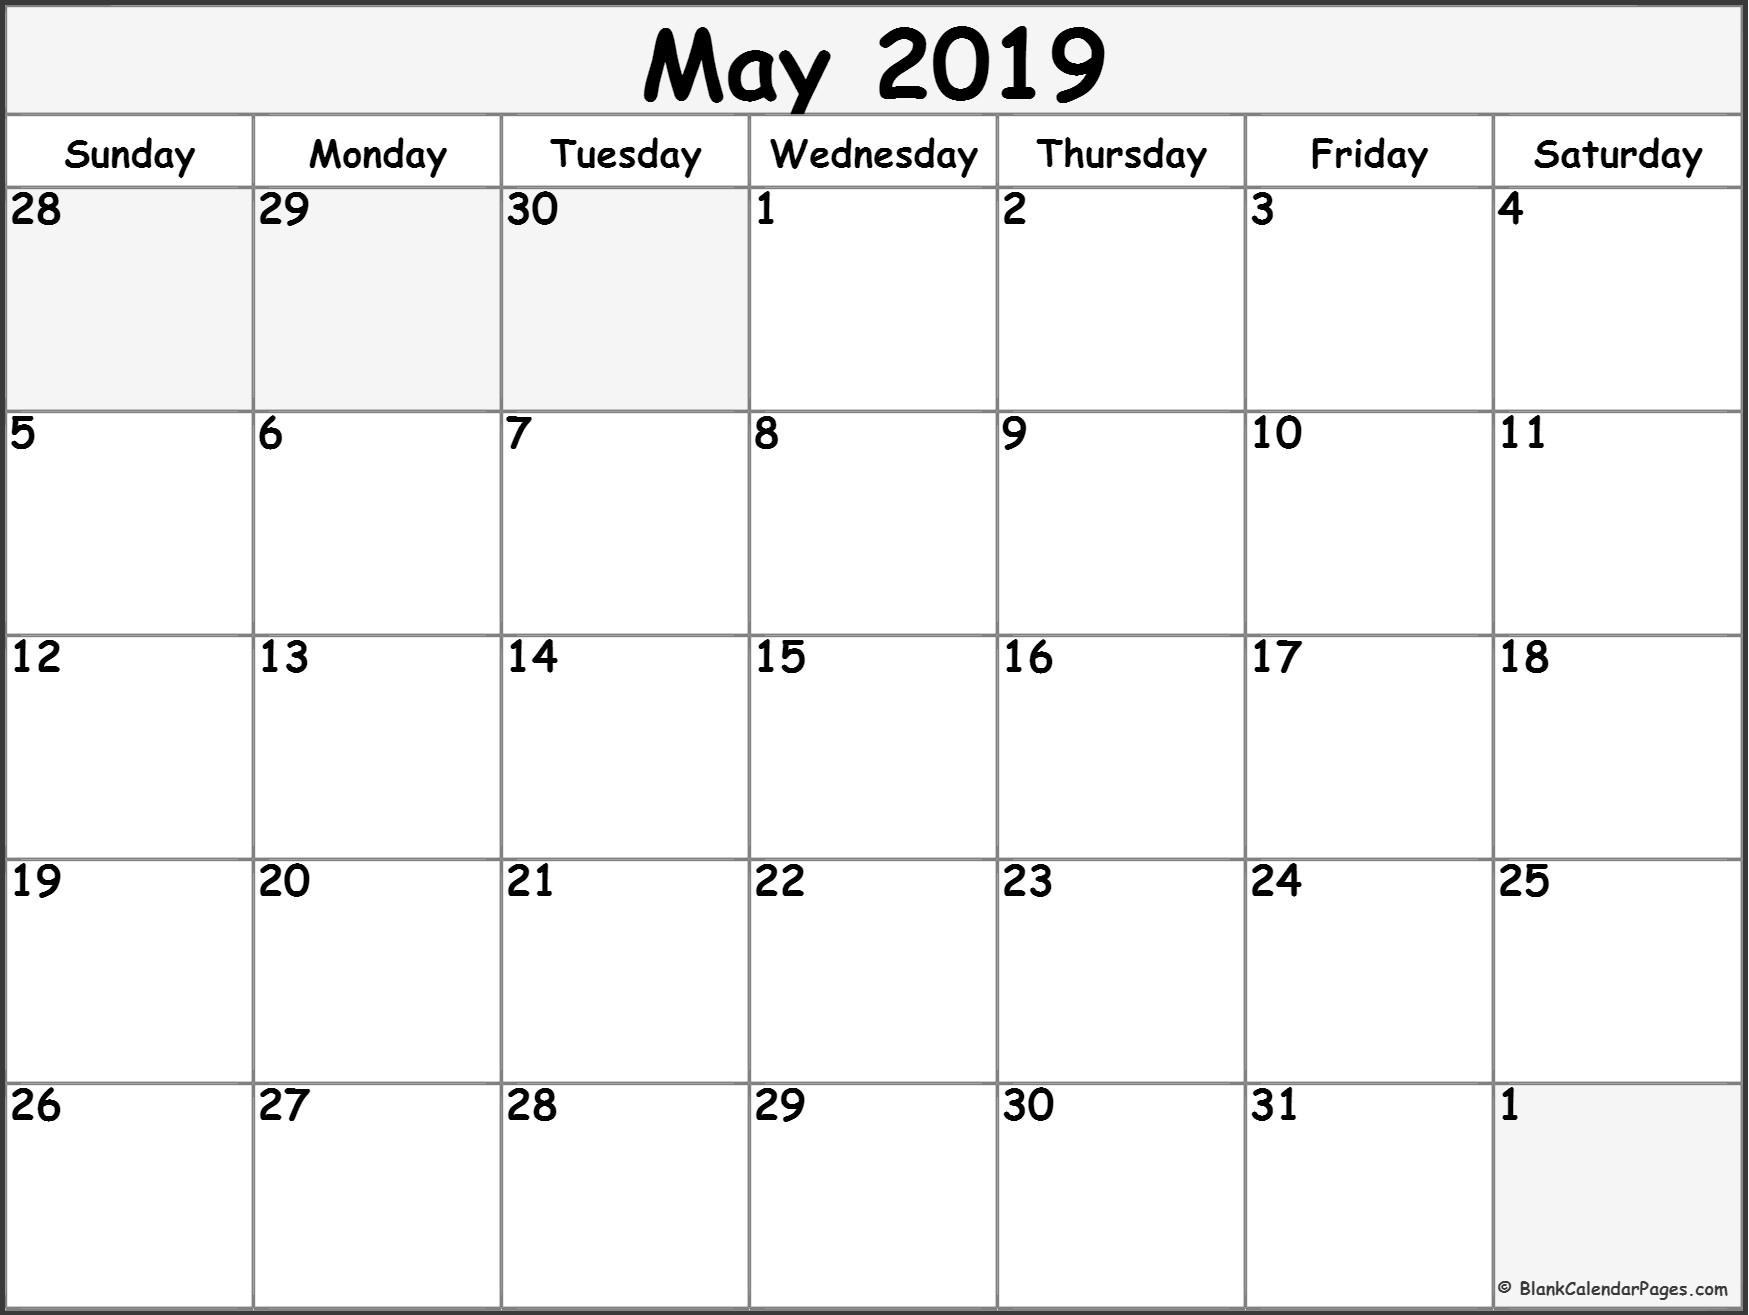 Calendar May 2019 6   Stln May 6 2019 Calendar